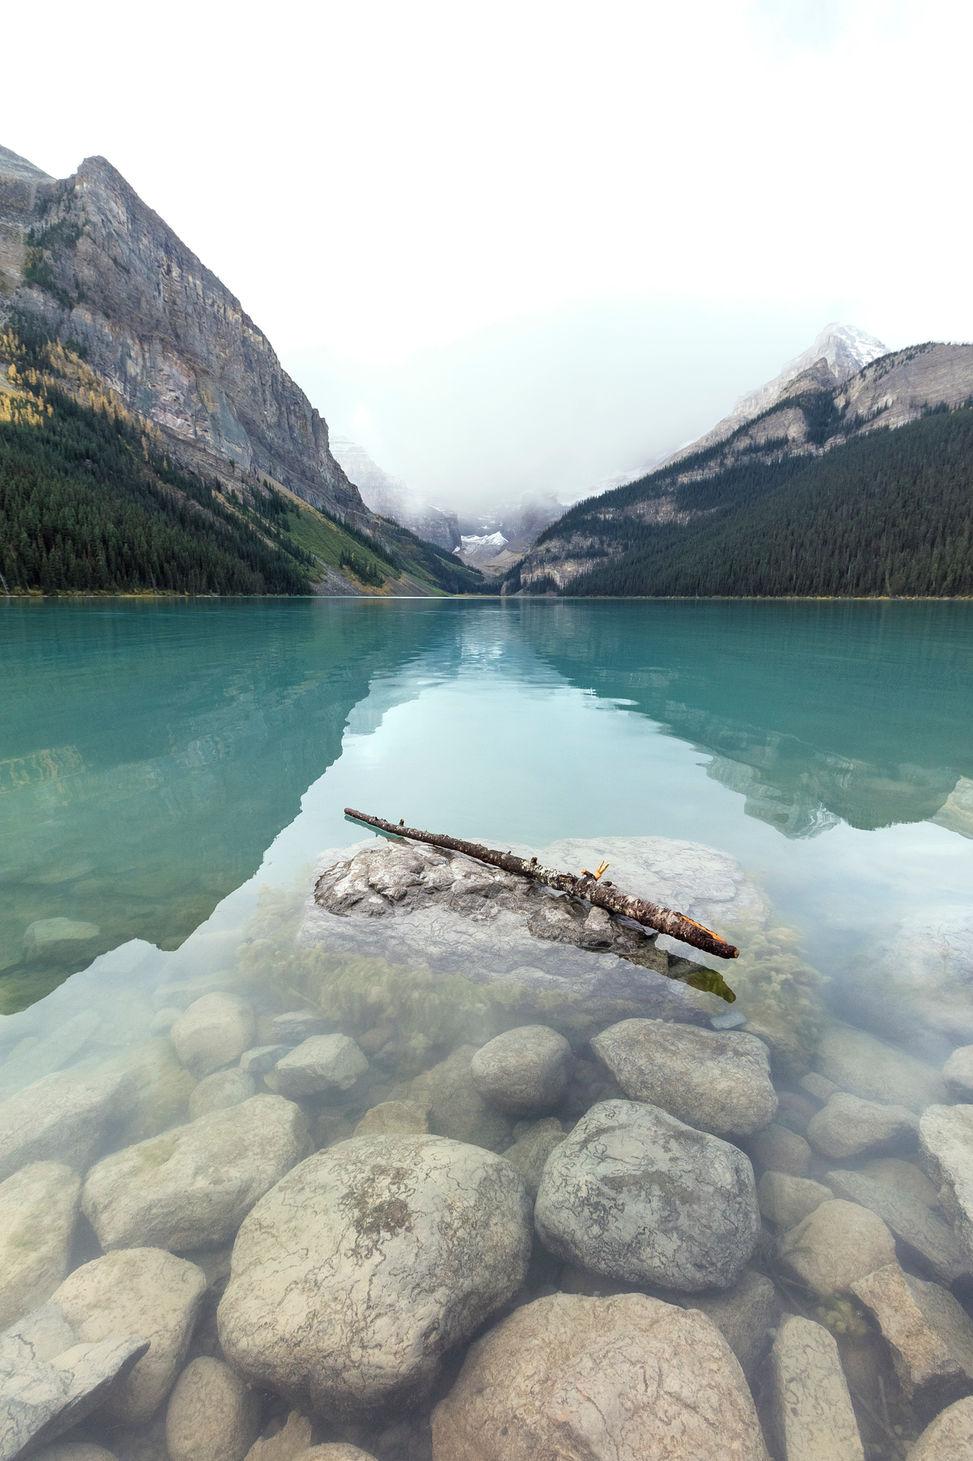 Lake Louise, BC, Canada